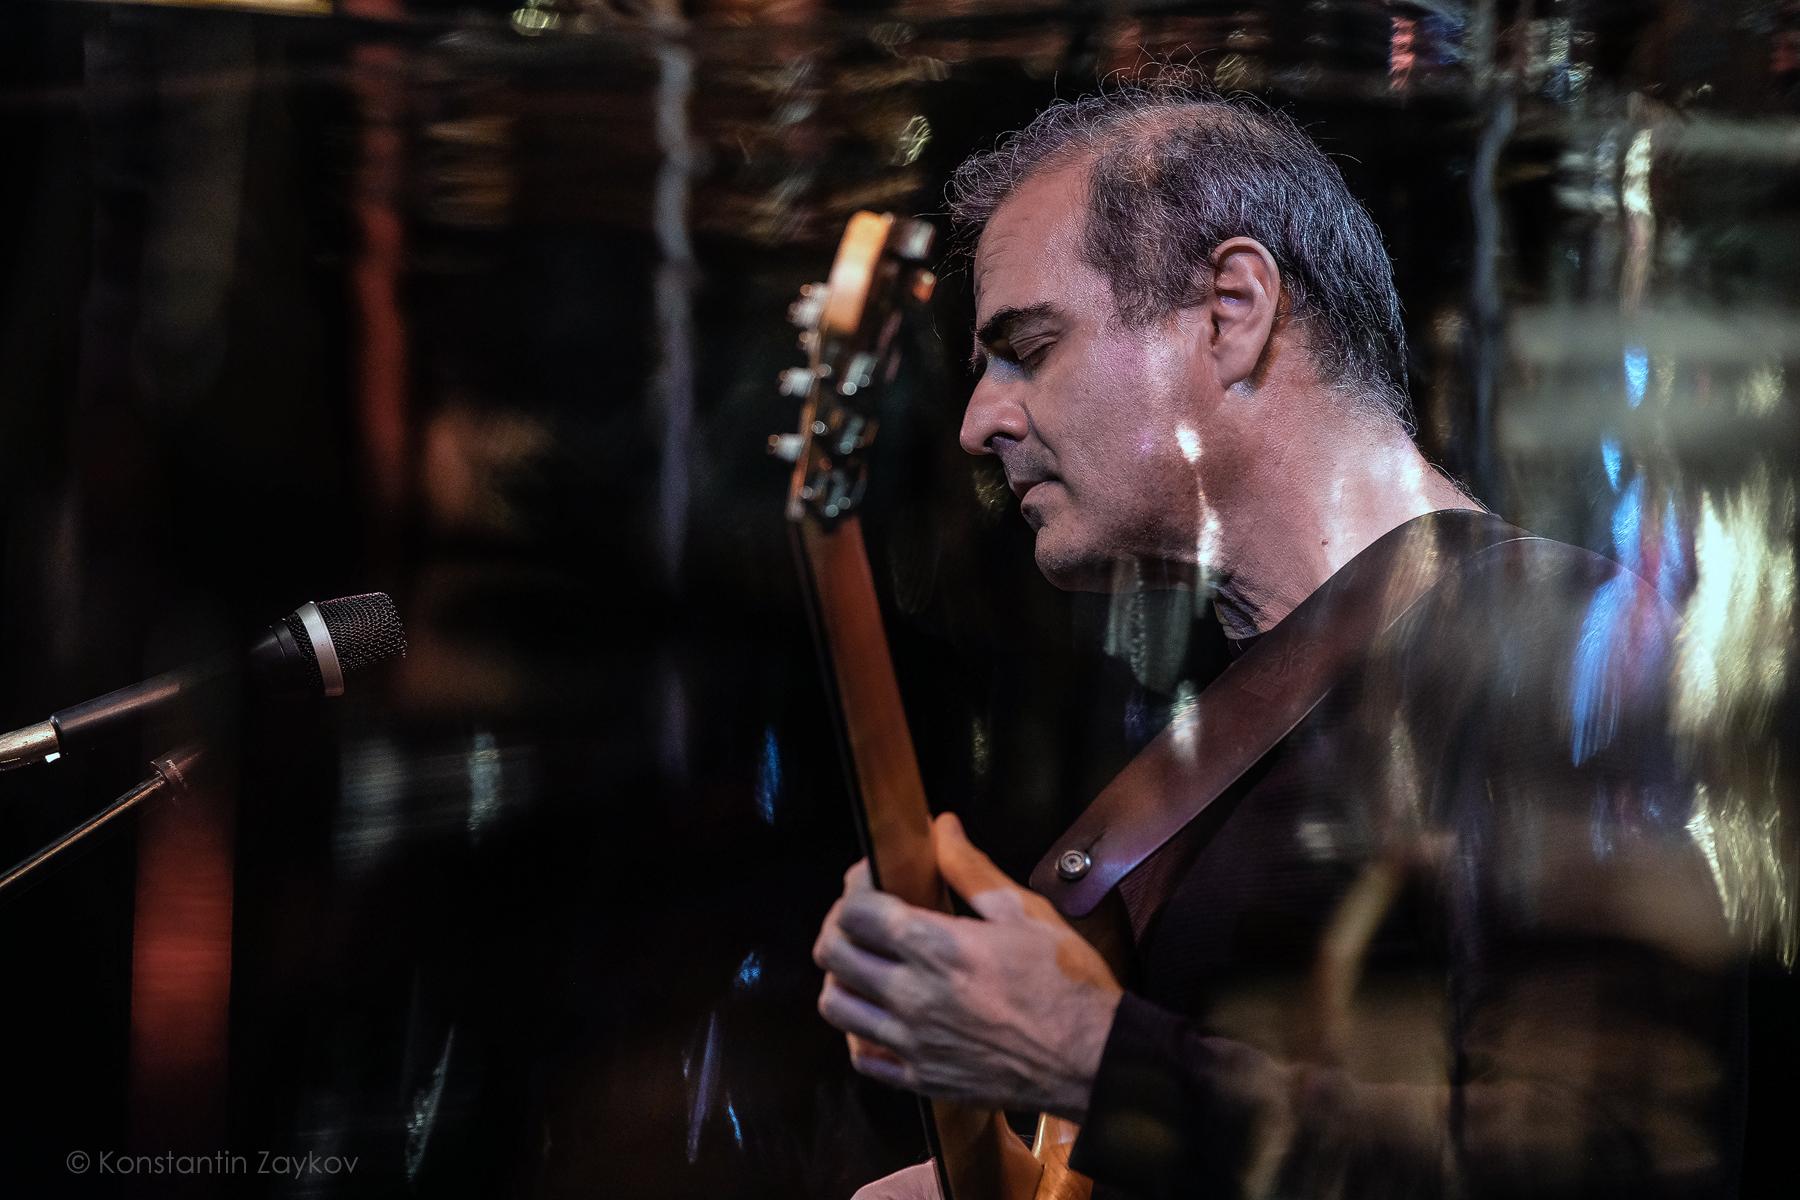 Bass guitarist from Greece Yiotis Kiourtsoglou